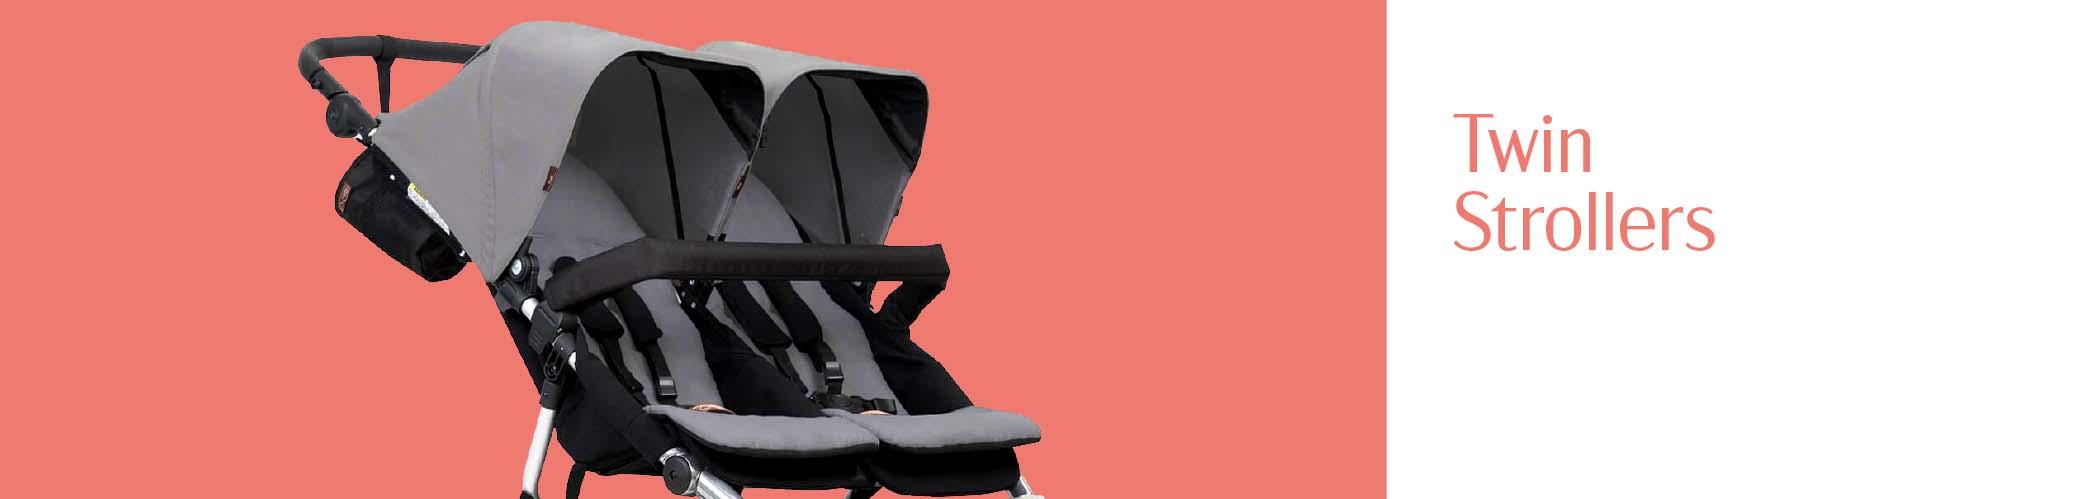 -09-twin-strollers-internalbanner-may21.jpg